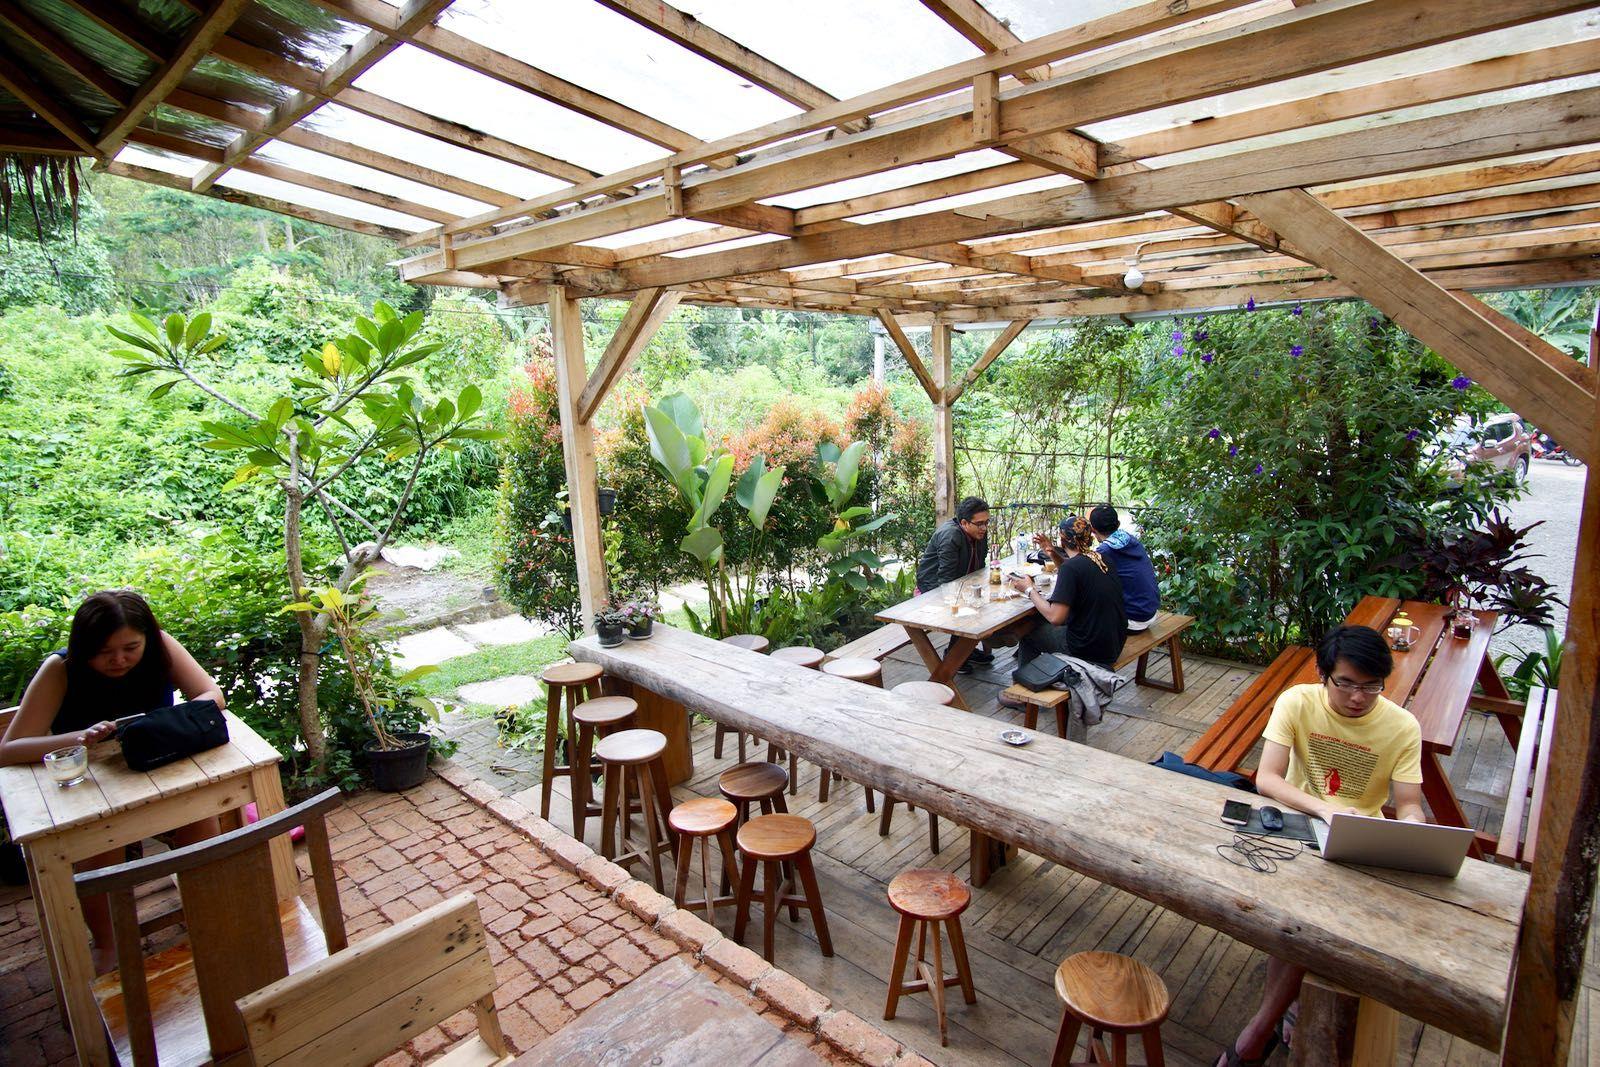 Beranda Armor Kopi Garden Hotel Desain Desain Restoran Desain Interior Kafe Backyard garden healthy drinks cafe